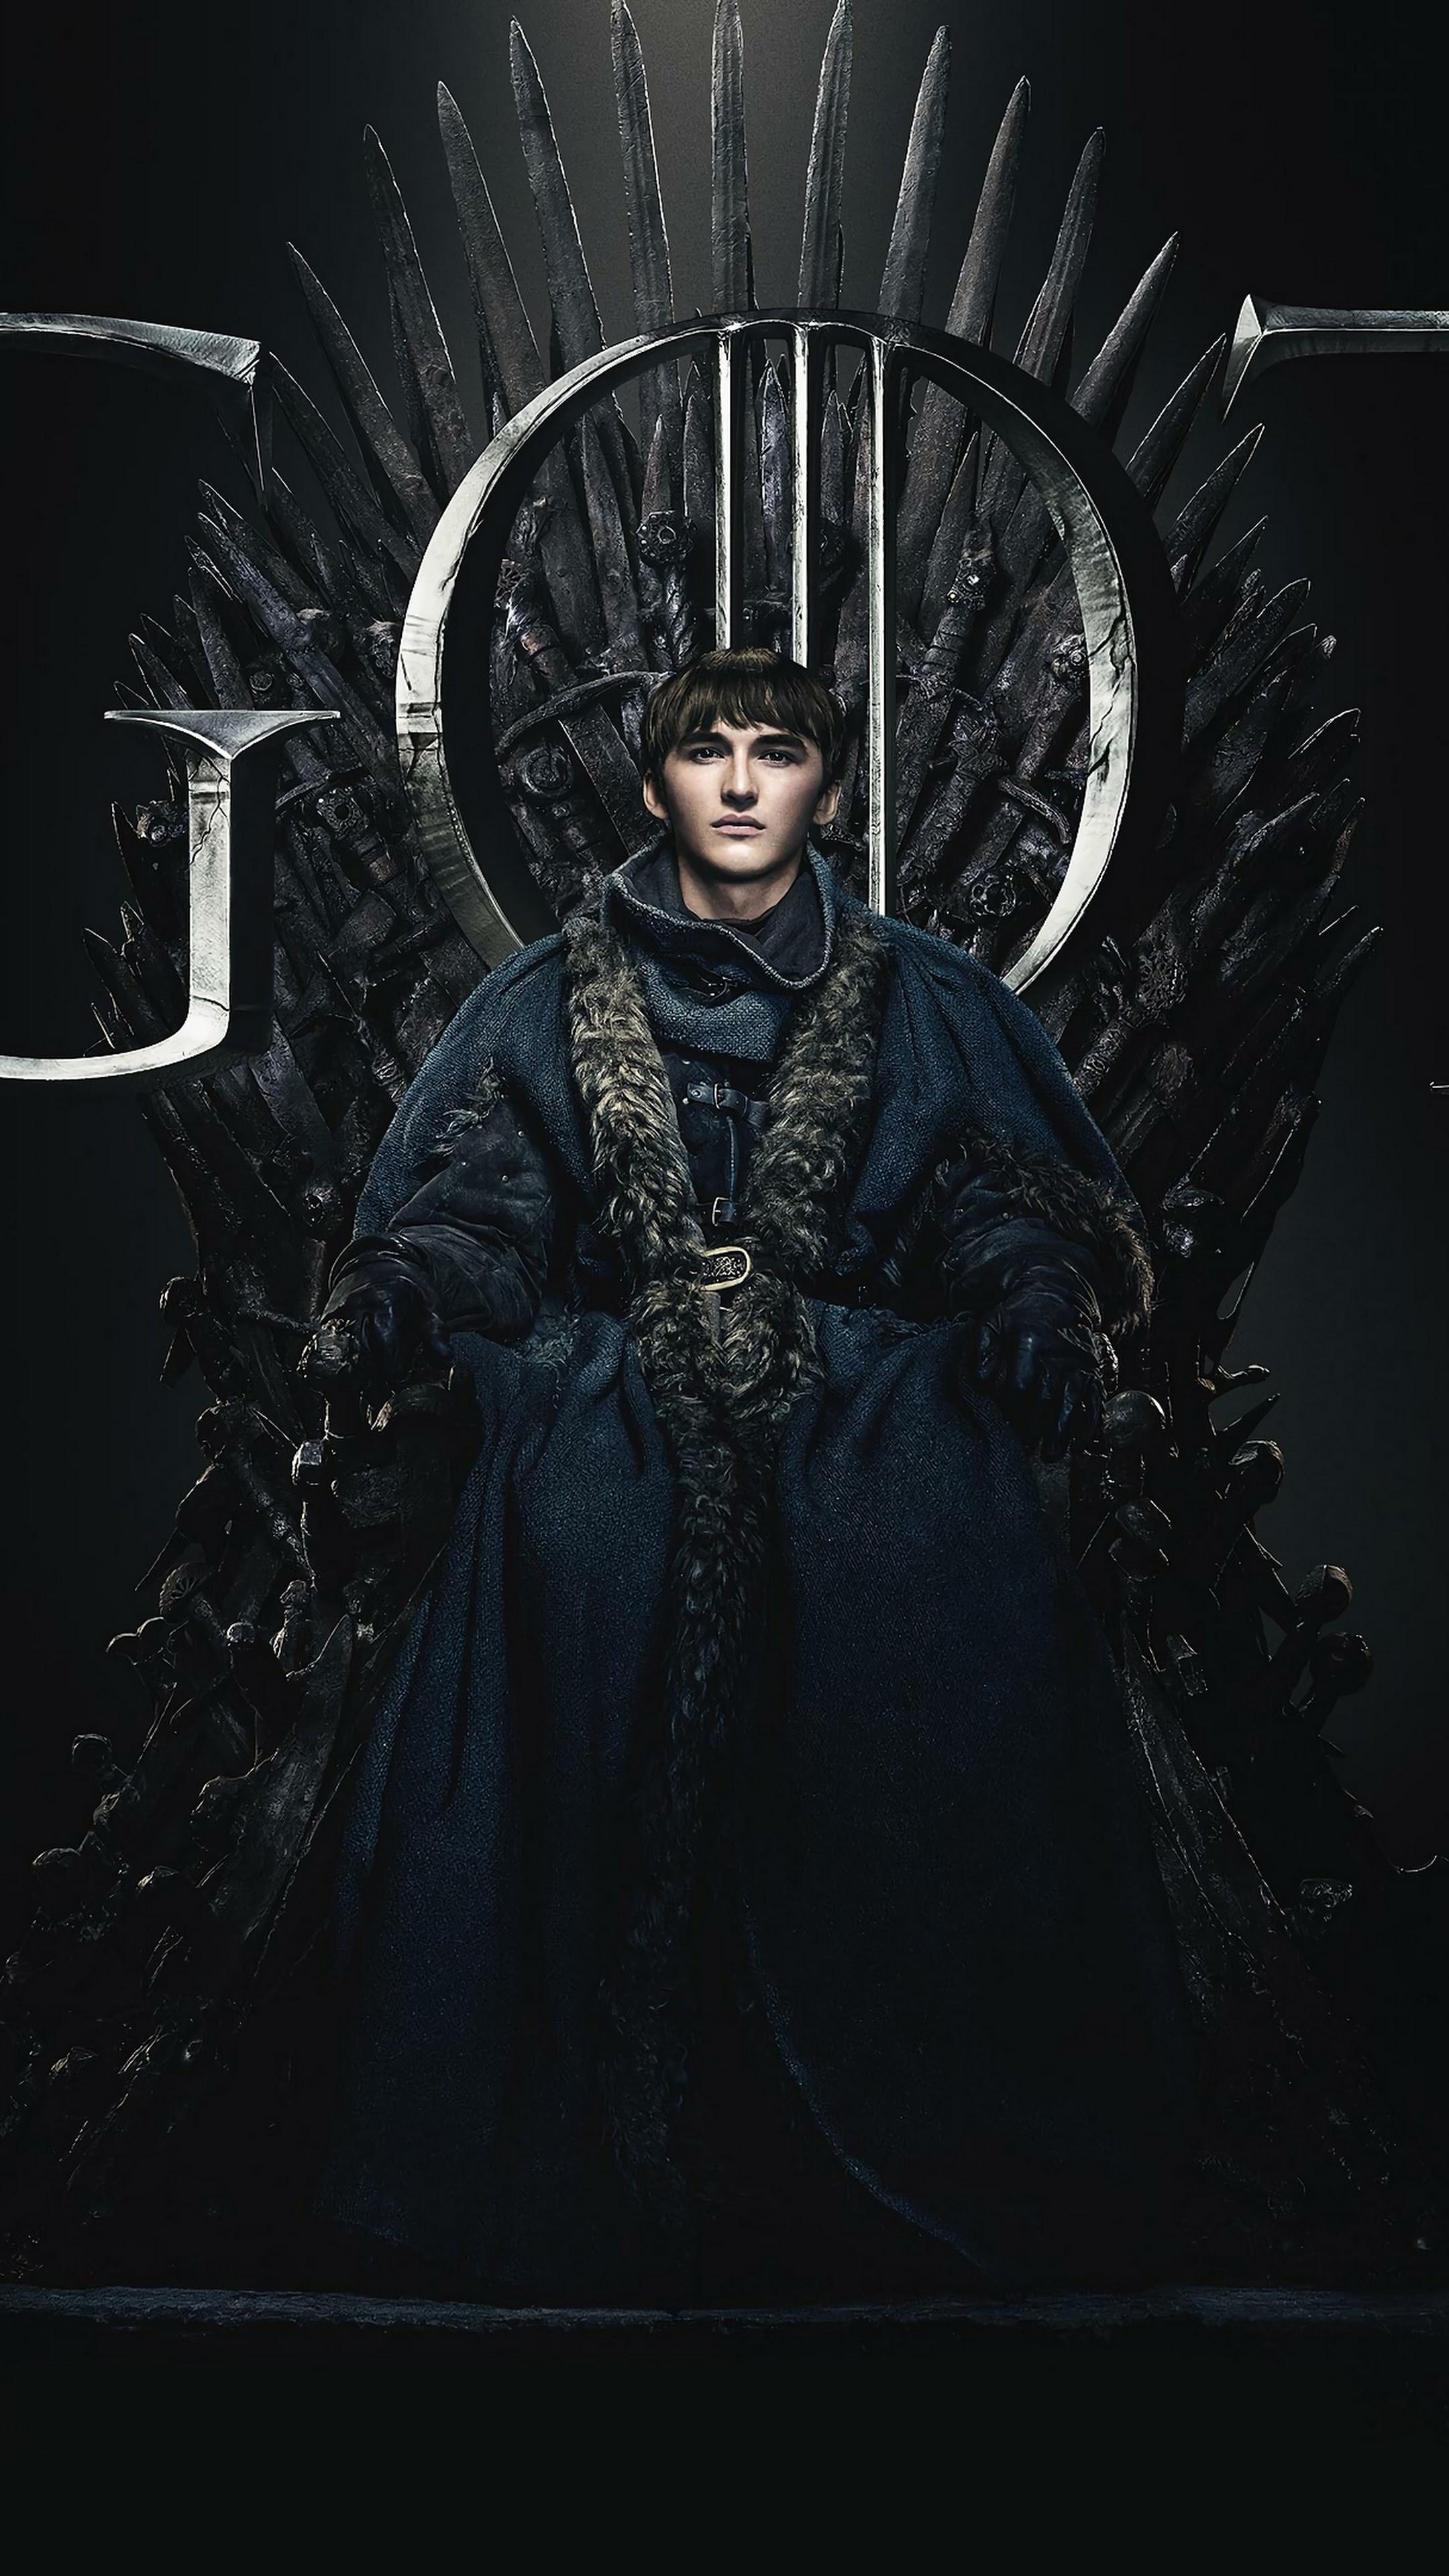 Bran Stark, Game Of Thrones, Season 8, 4k, - Bran Stark Quotes Season 8 - HD Wallpaper